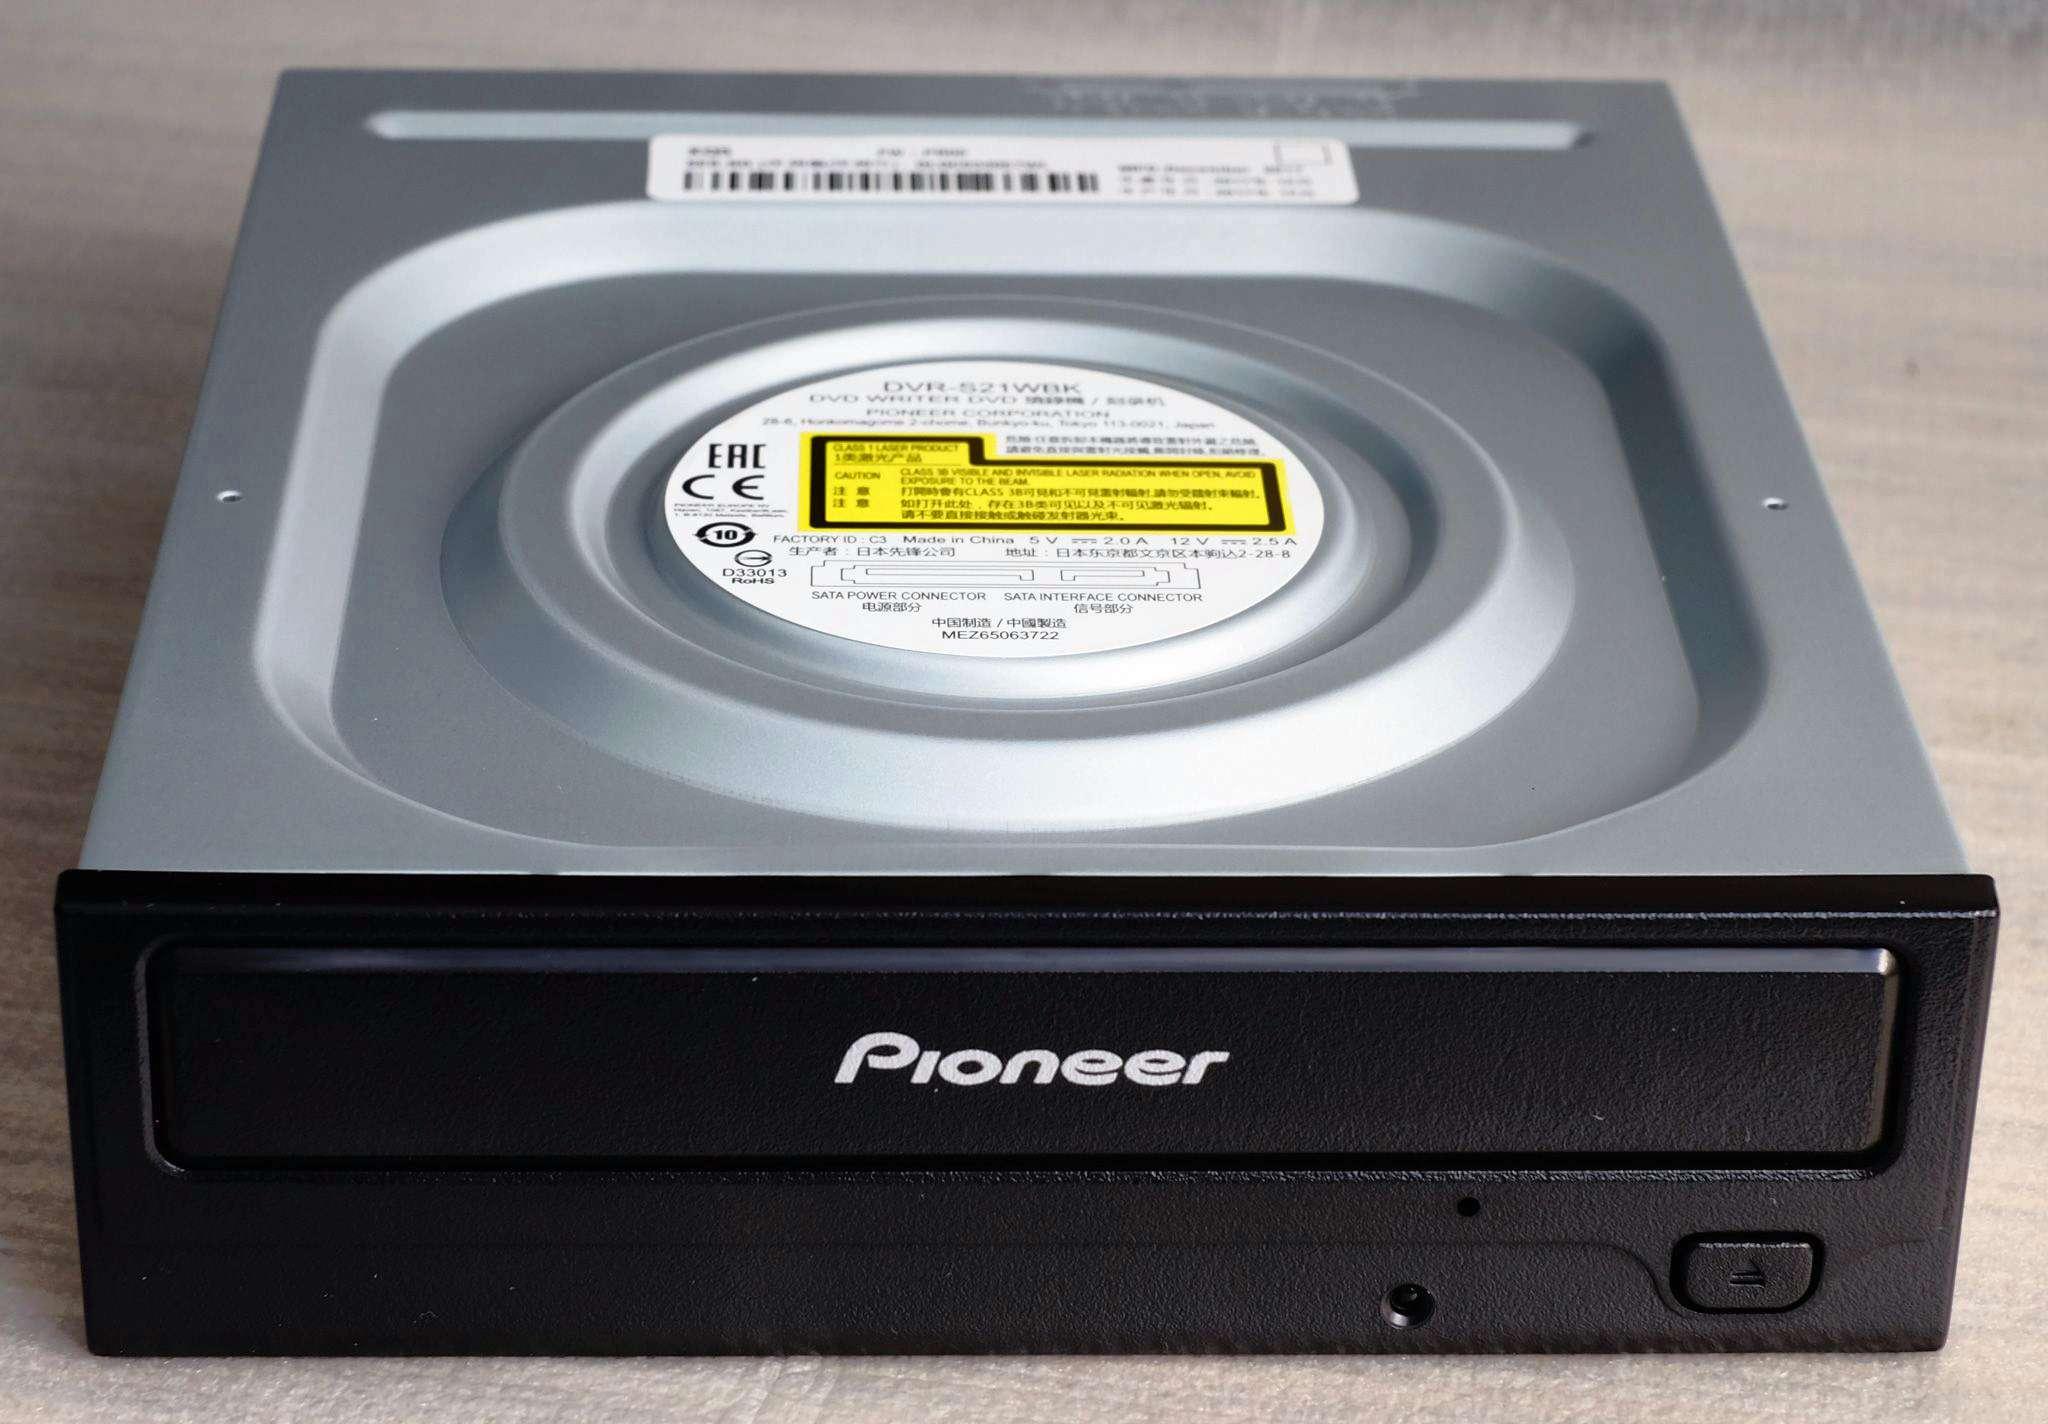 PIONEER DVD-RW DVR 216D ATA DEVICE DRIVER WINDOWS